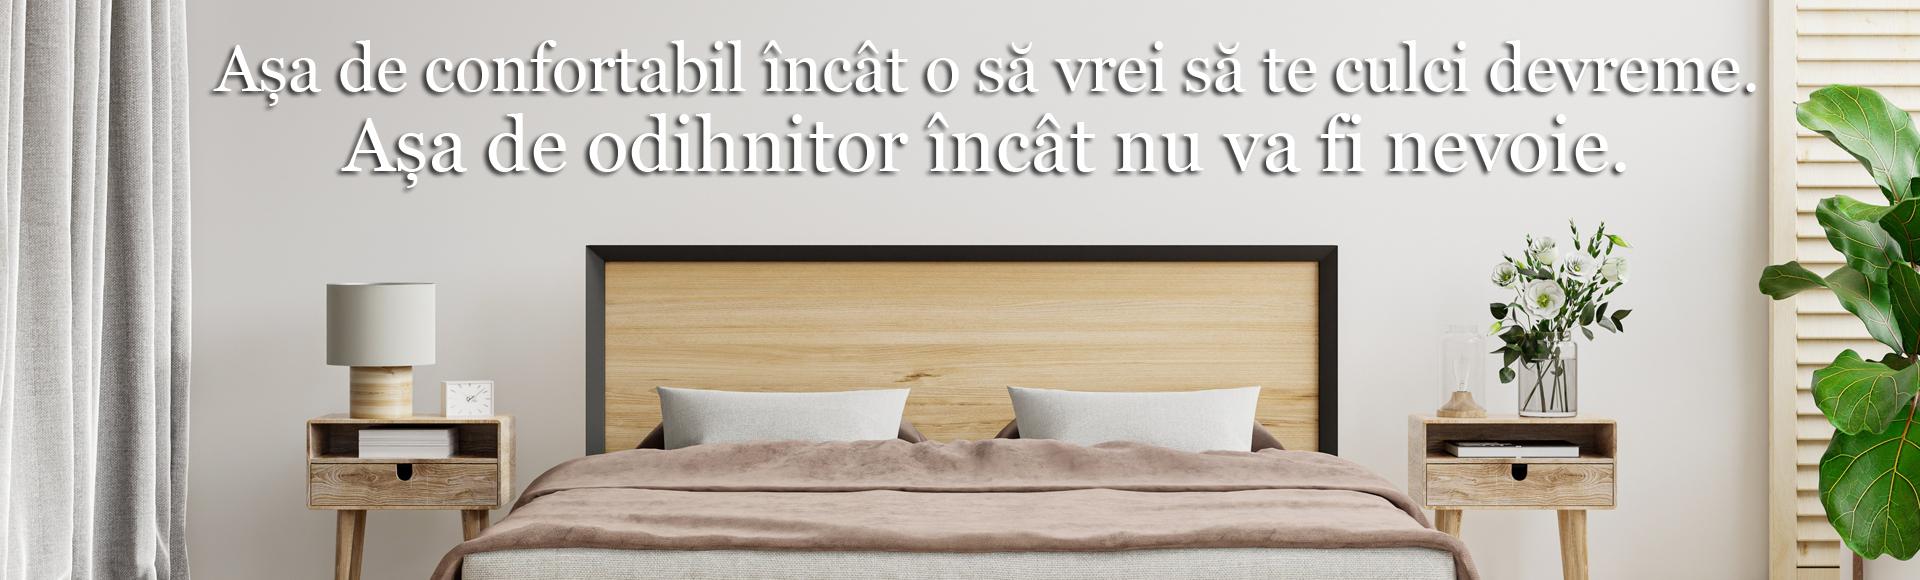 Banner pagina paturi